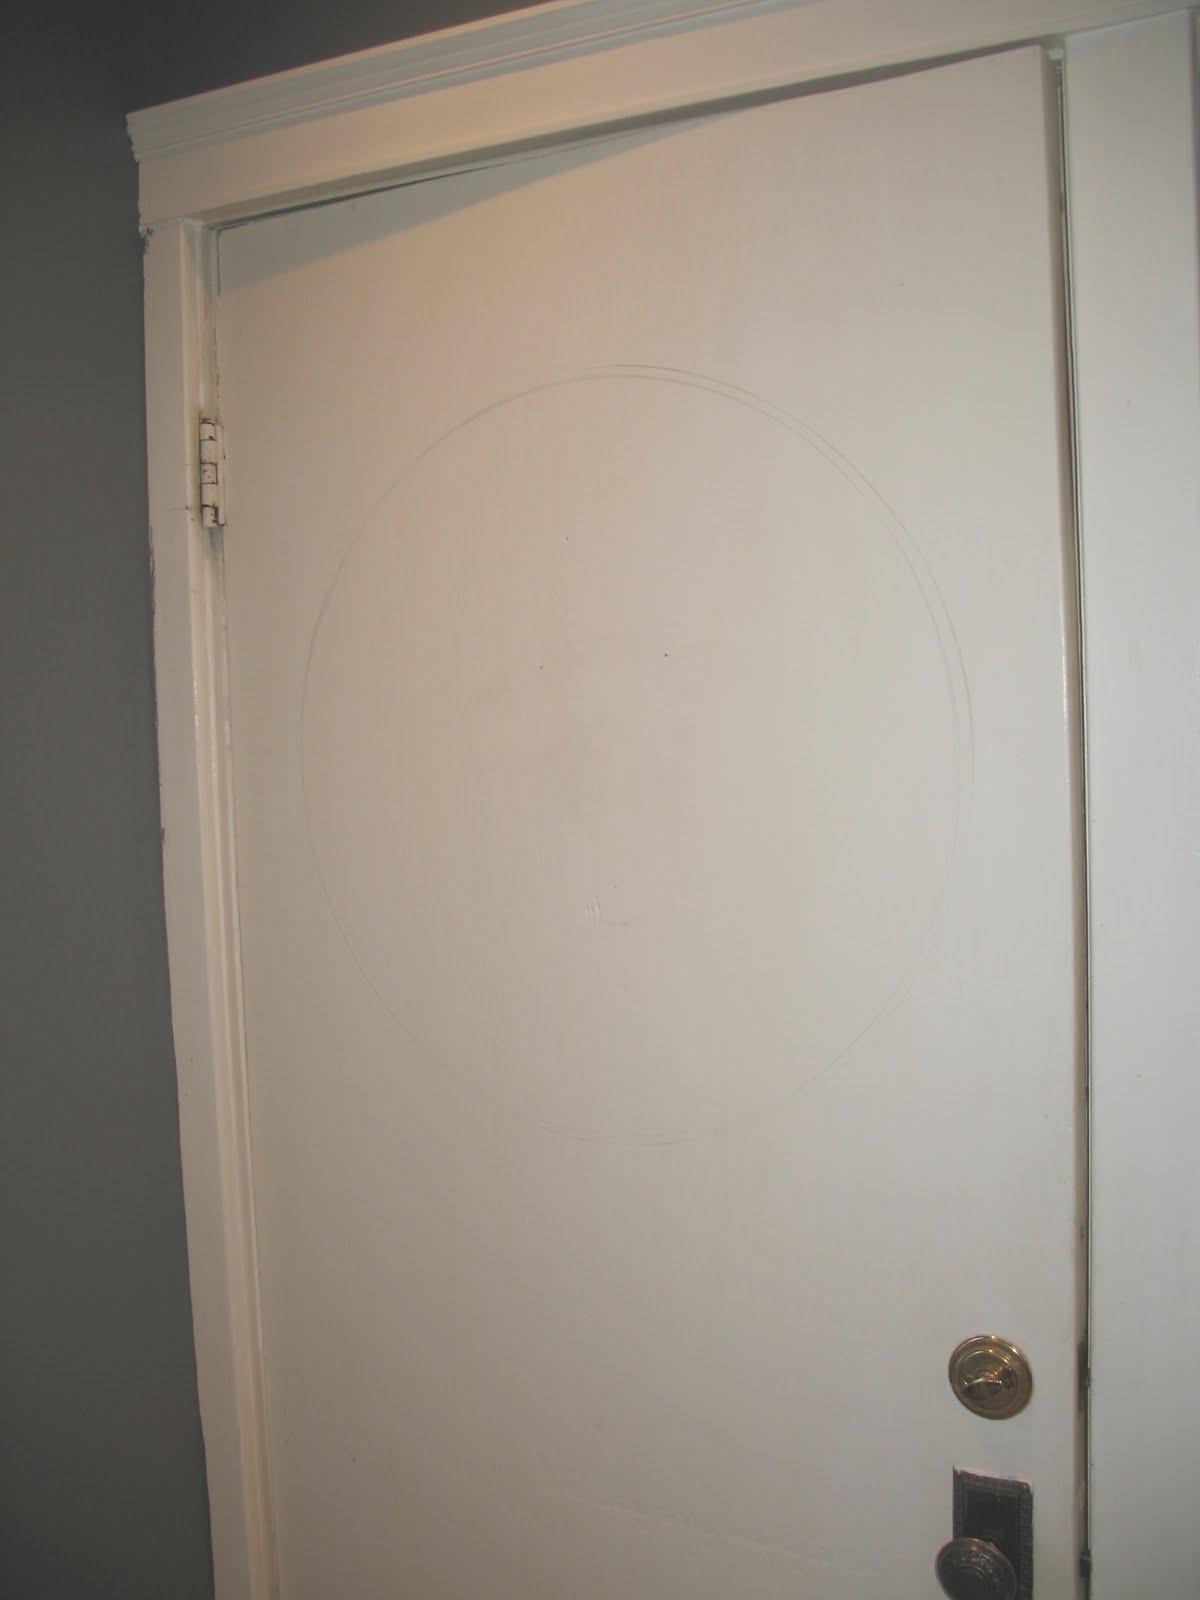 Timeless Style Design Dressing Up A Plain Door